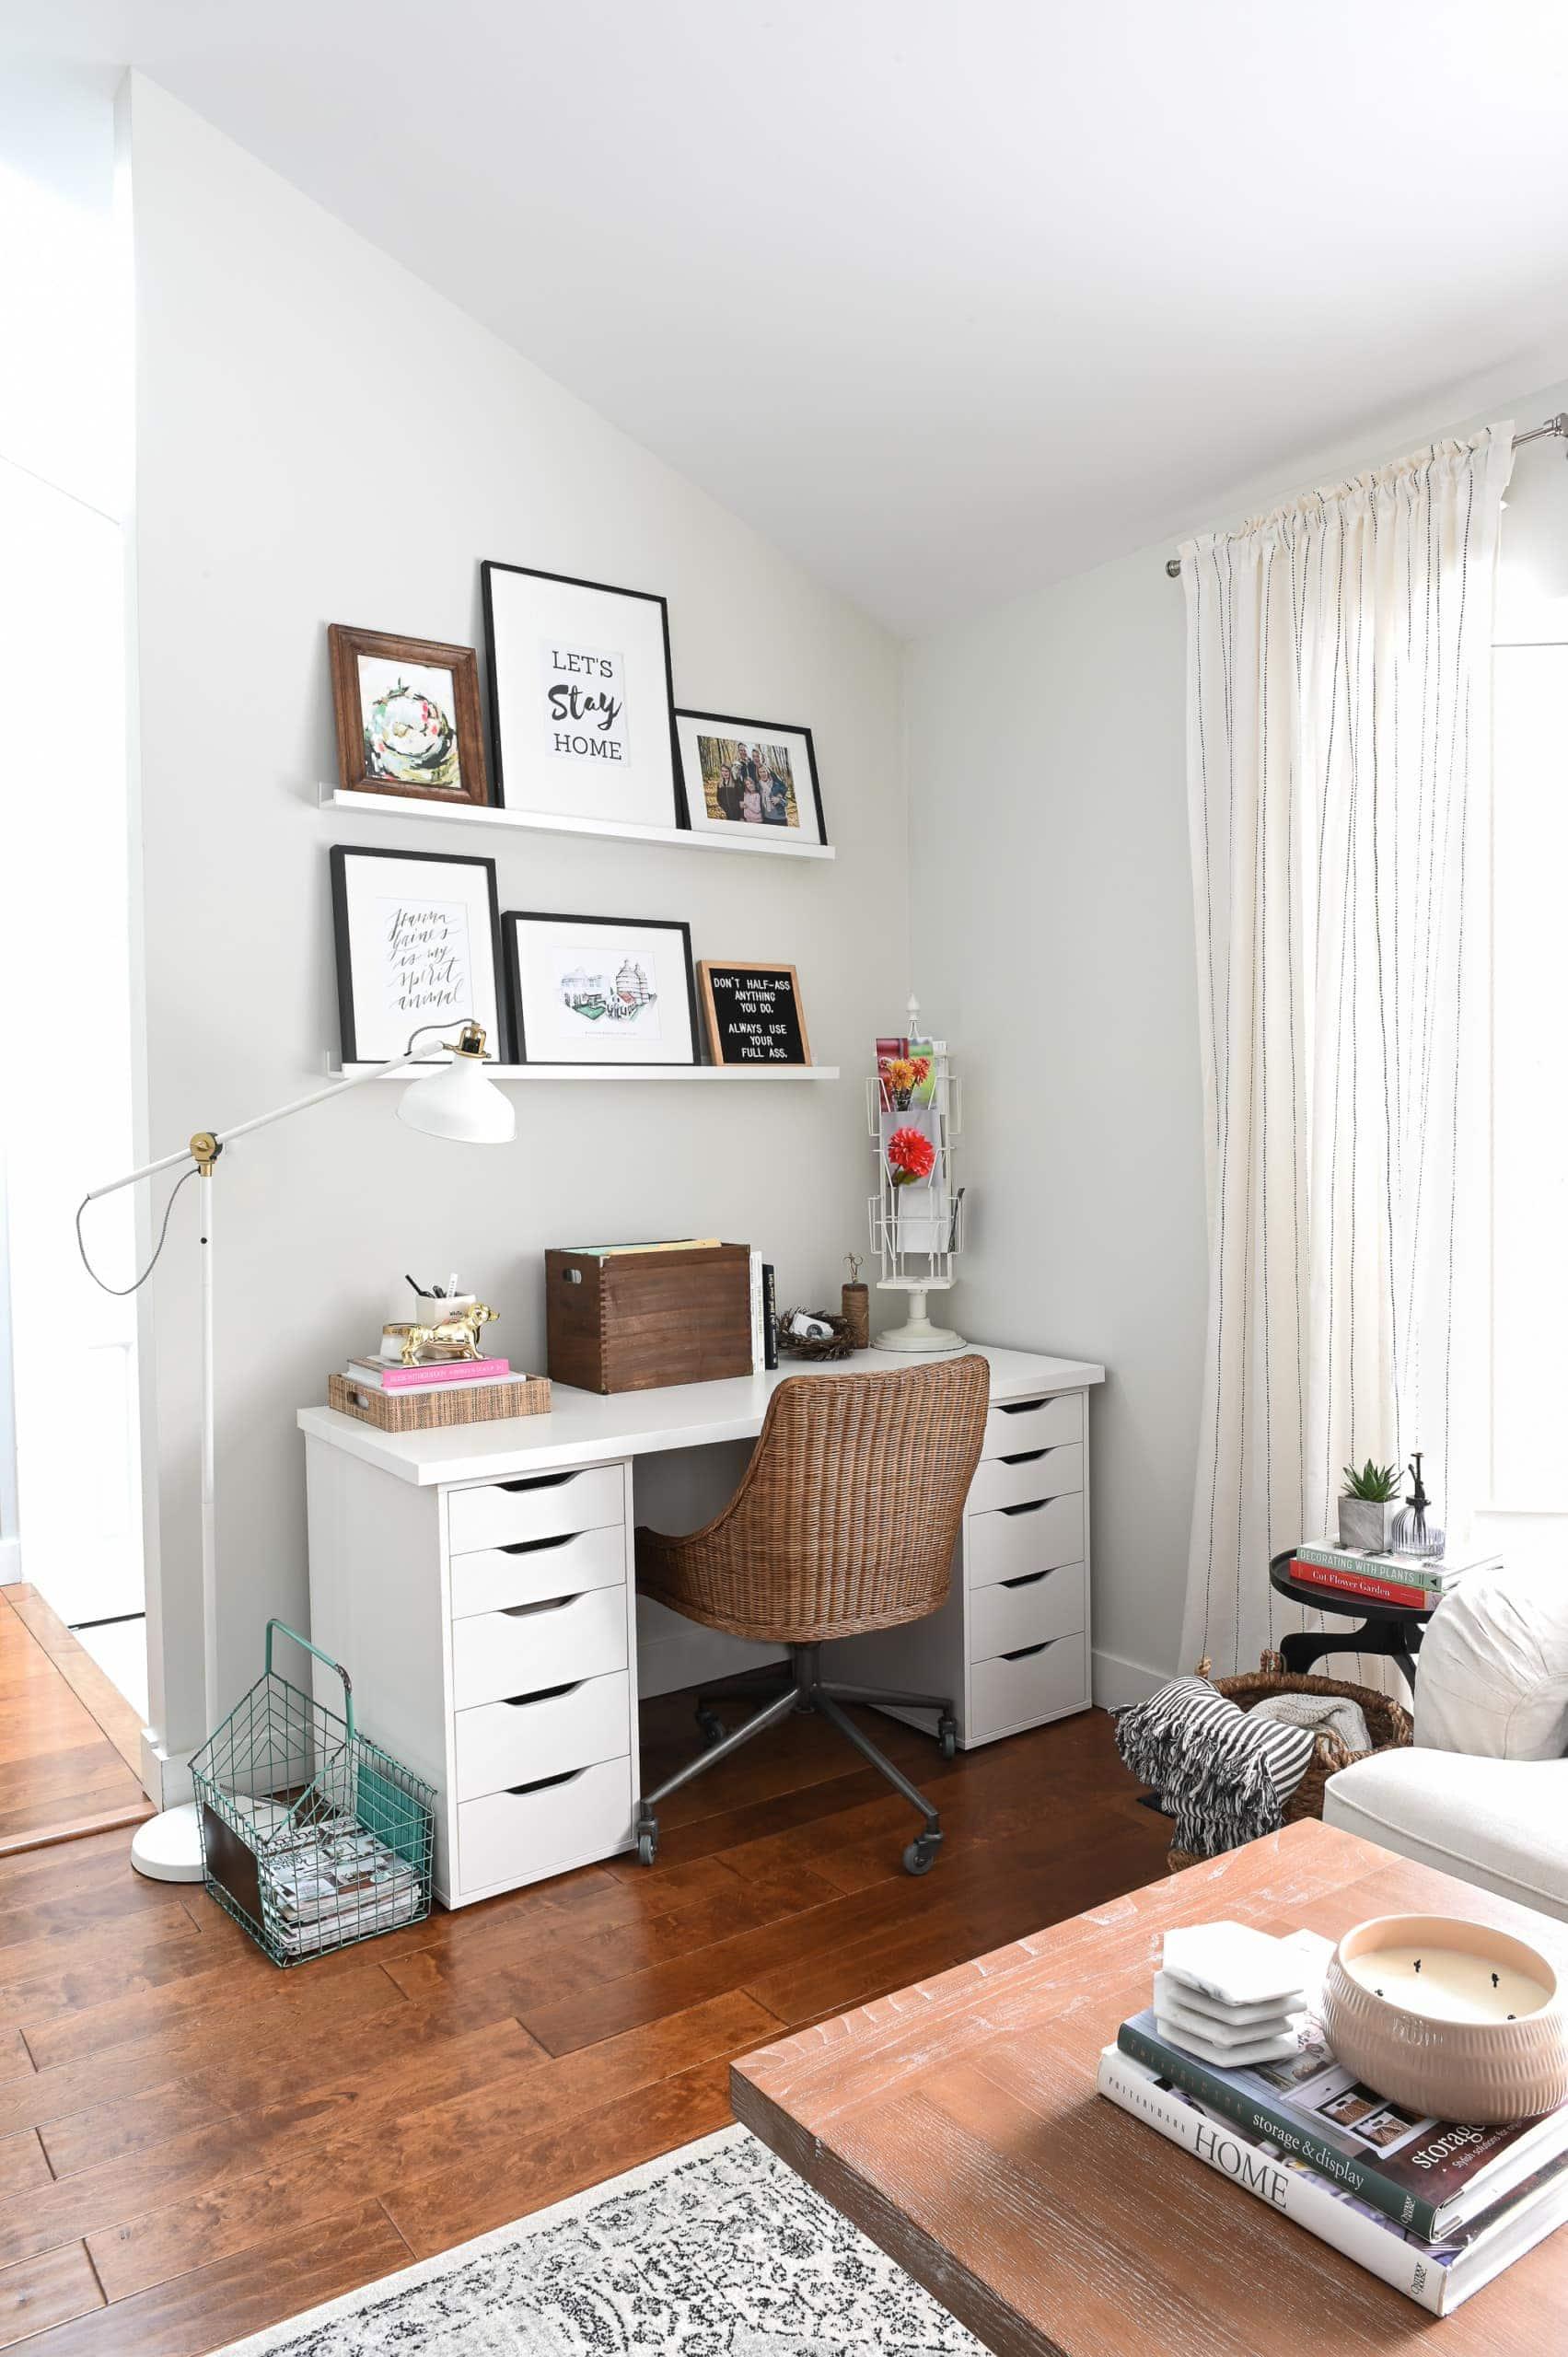 Kerri's Vancouver home